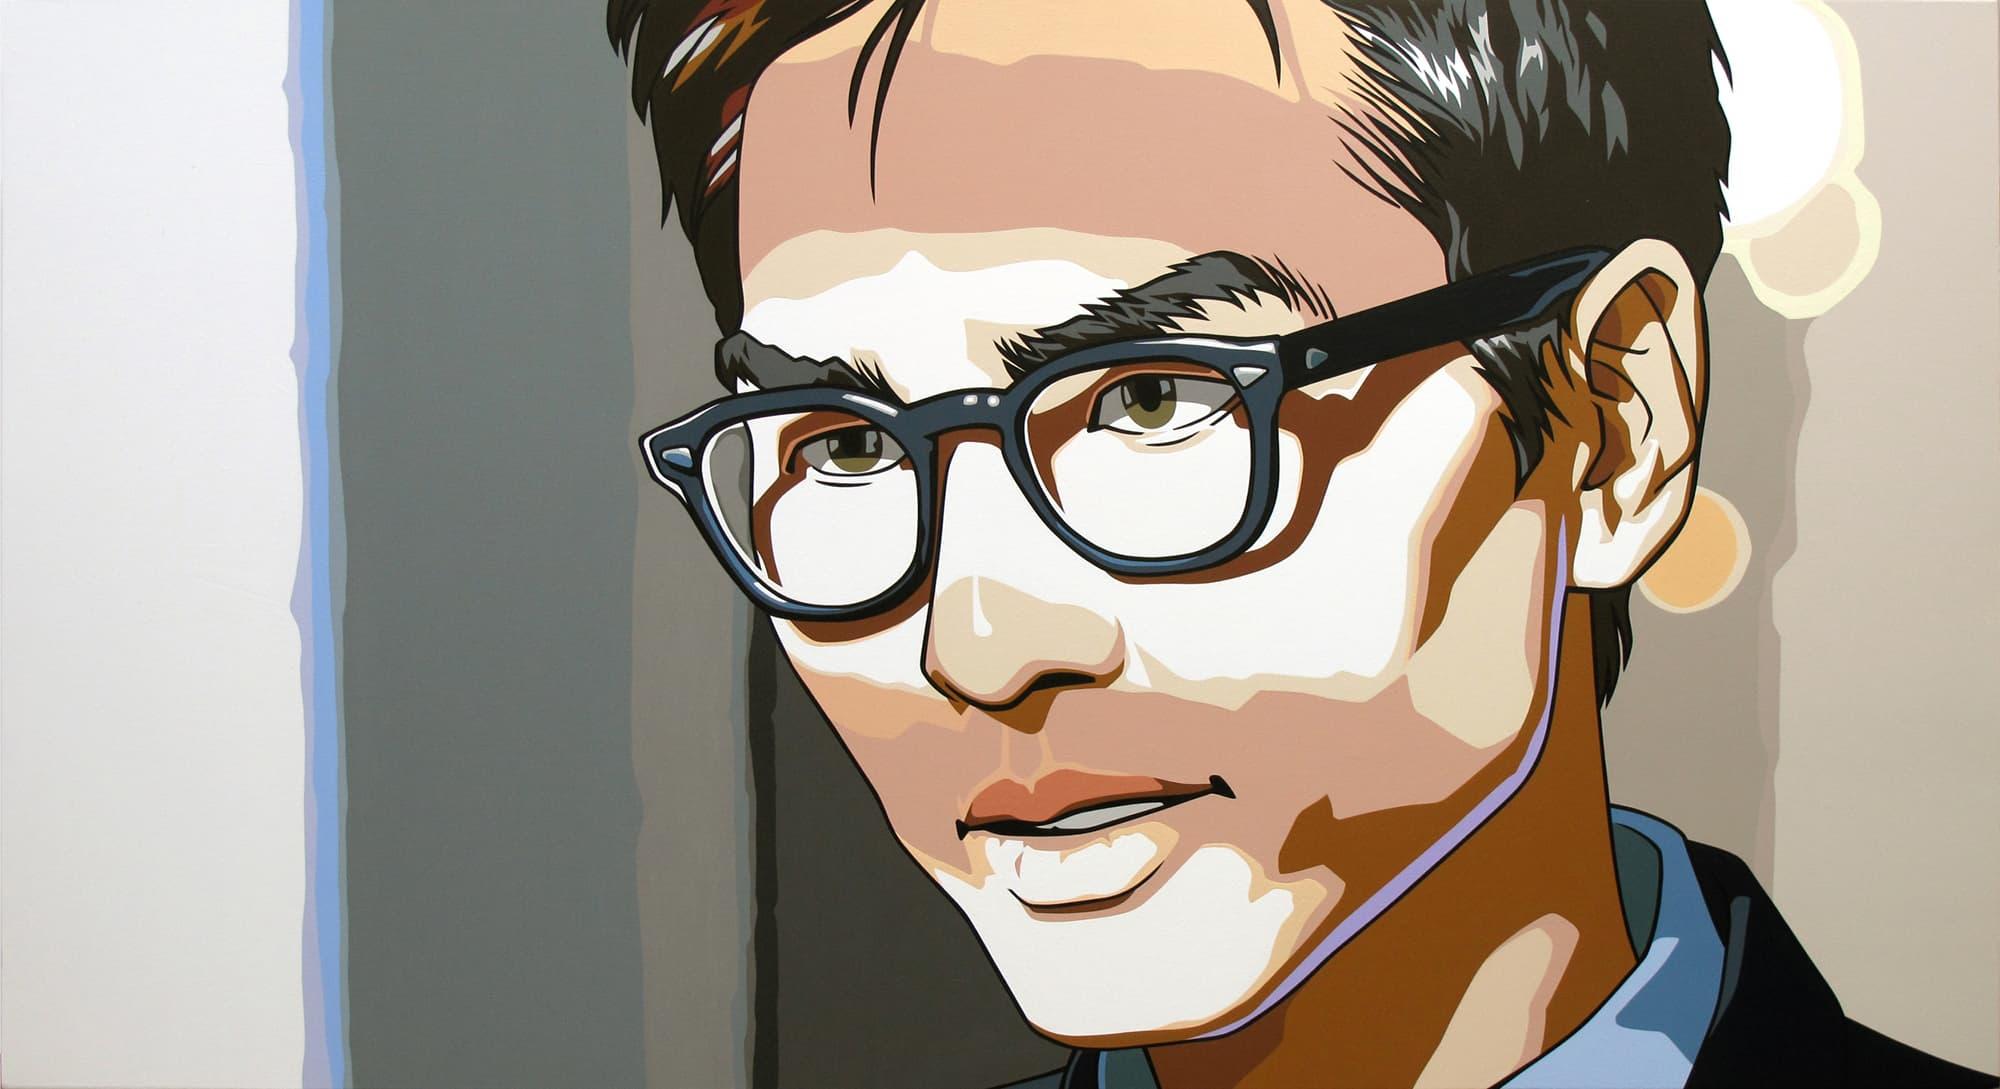 Dongi Lee, <em>Man with Glasses,</em> 2013